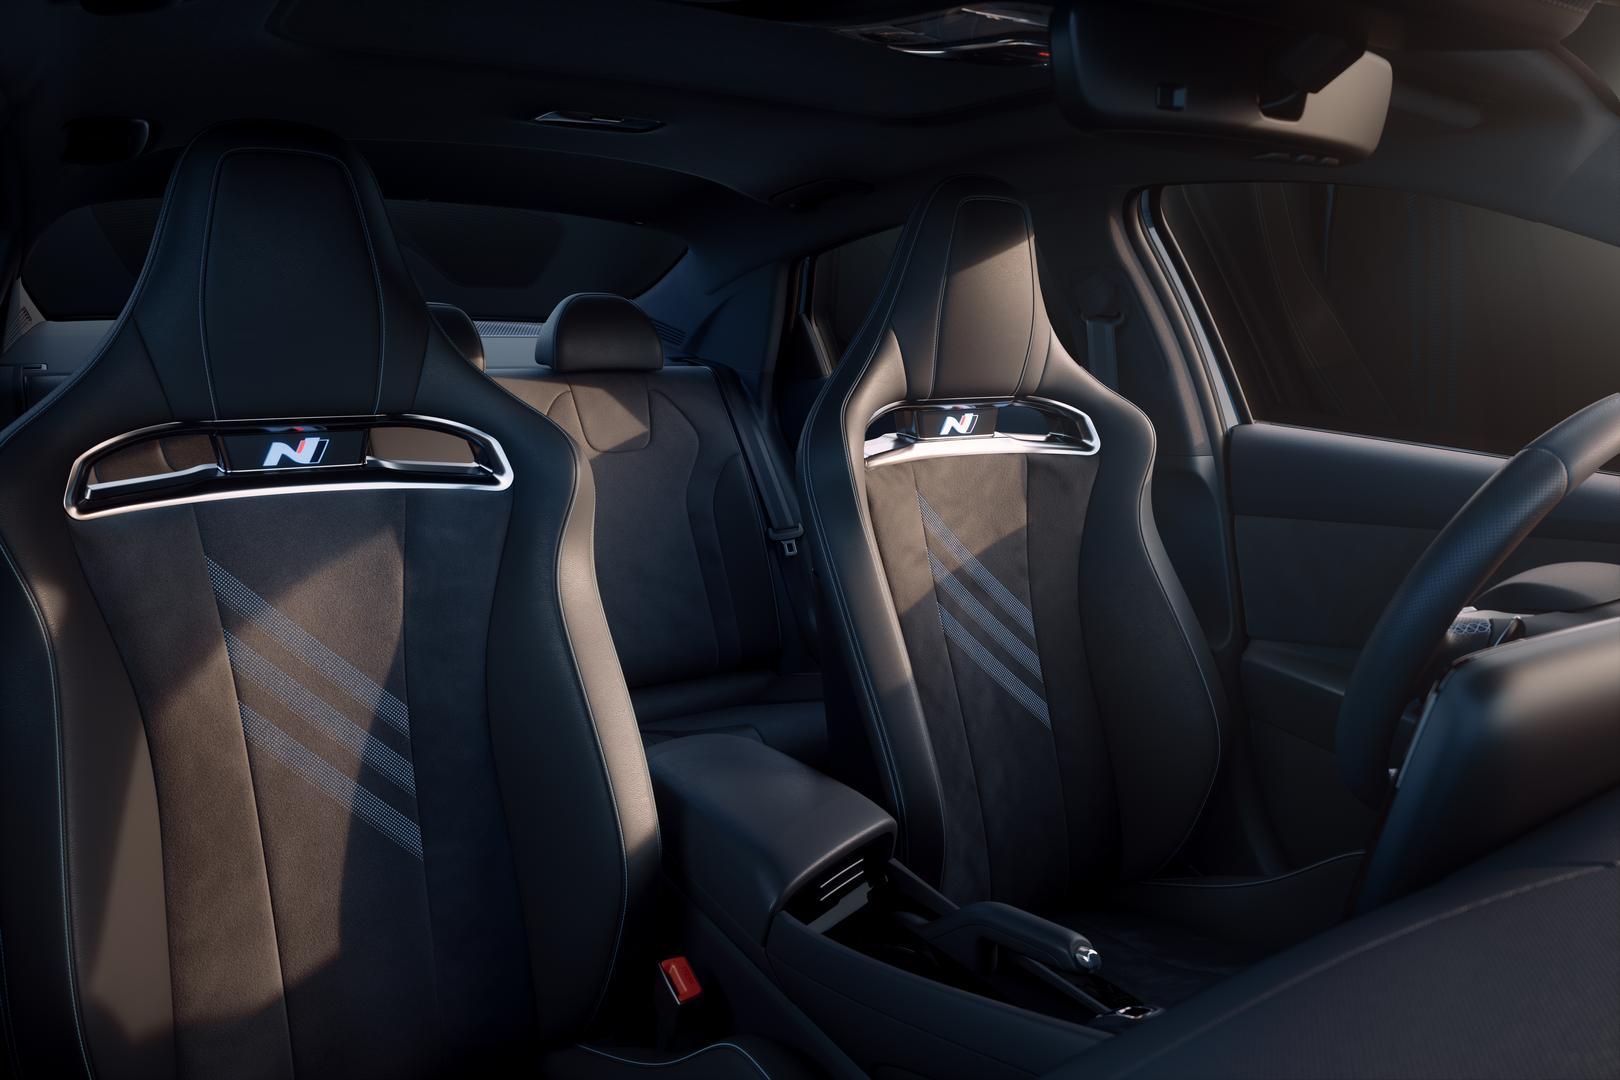 Hyundai Elantra N seats